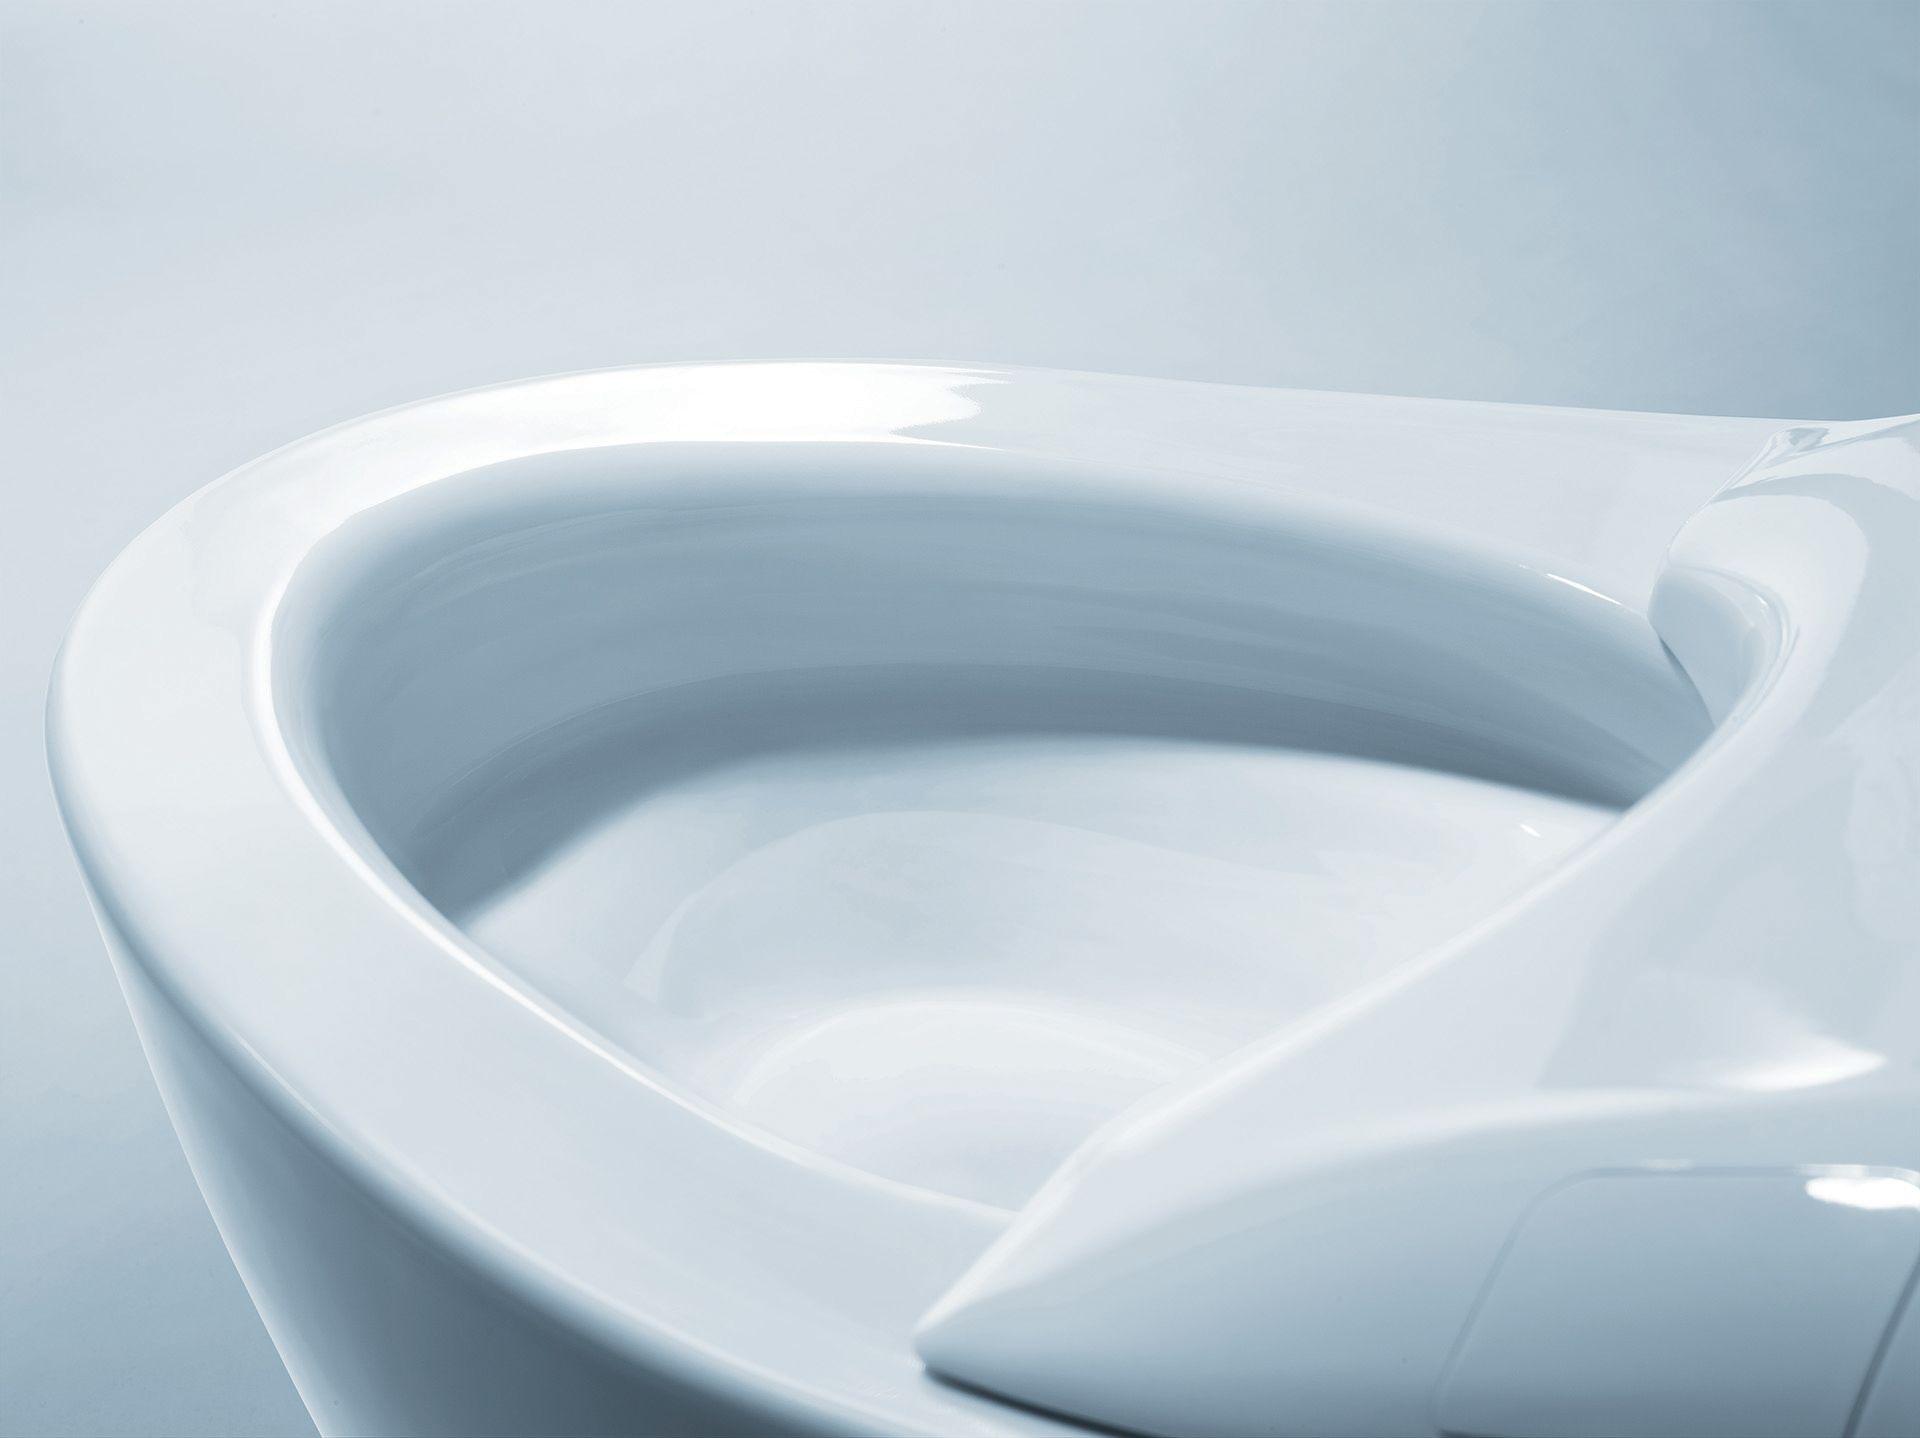 NEOREST® NX1 Dual Flush Toilet - 1.0 GPF & 0.8 GPF - TotoUSA.com